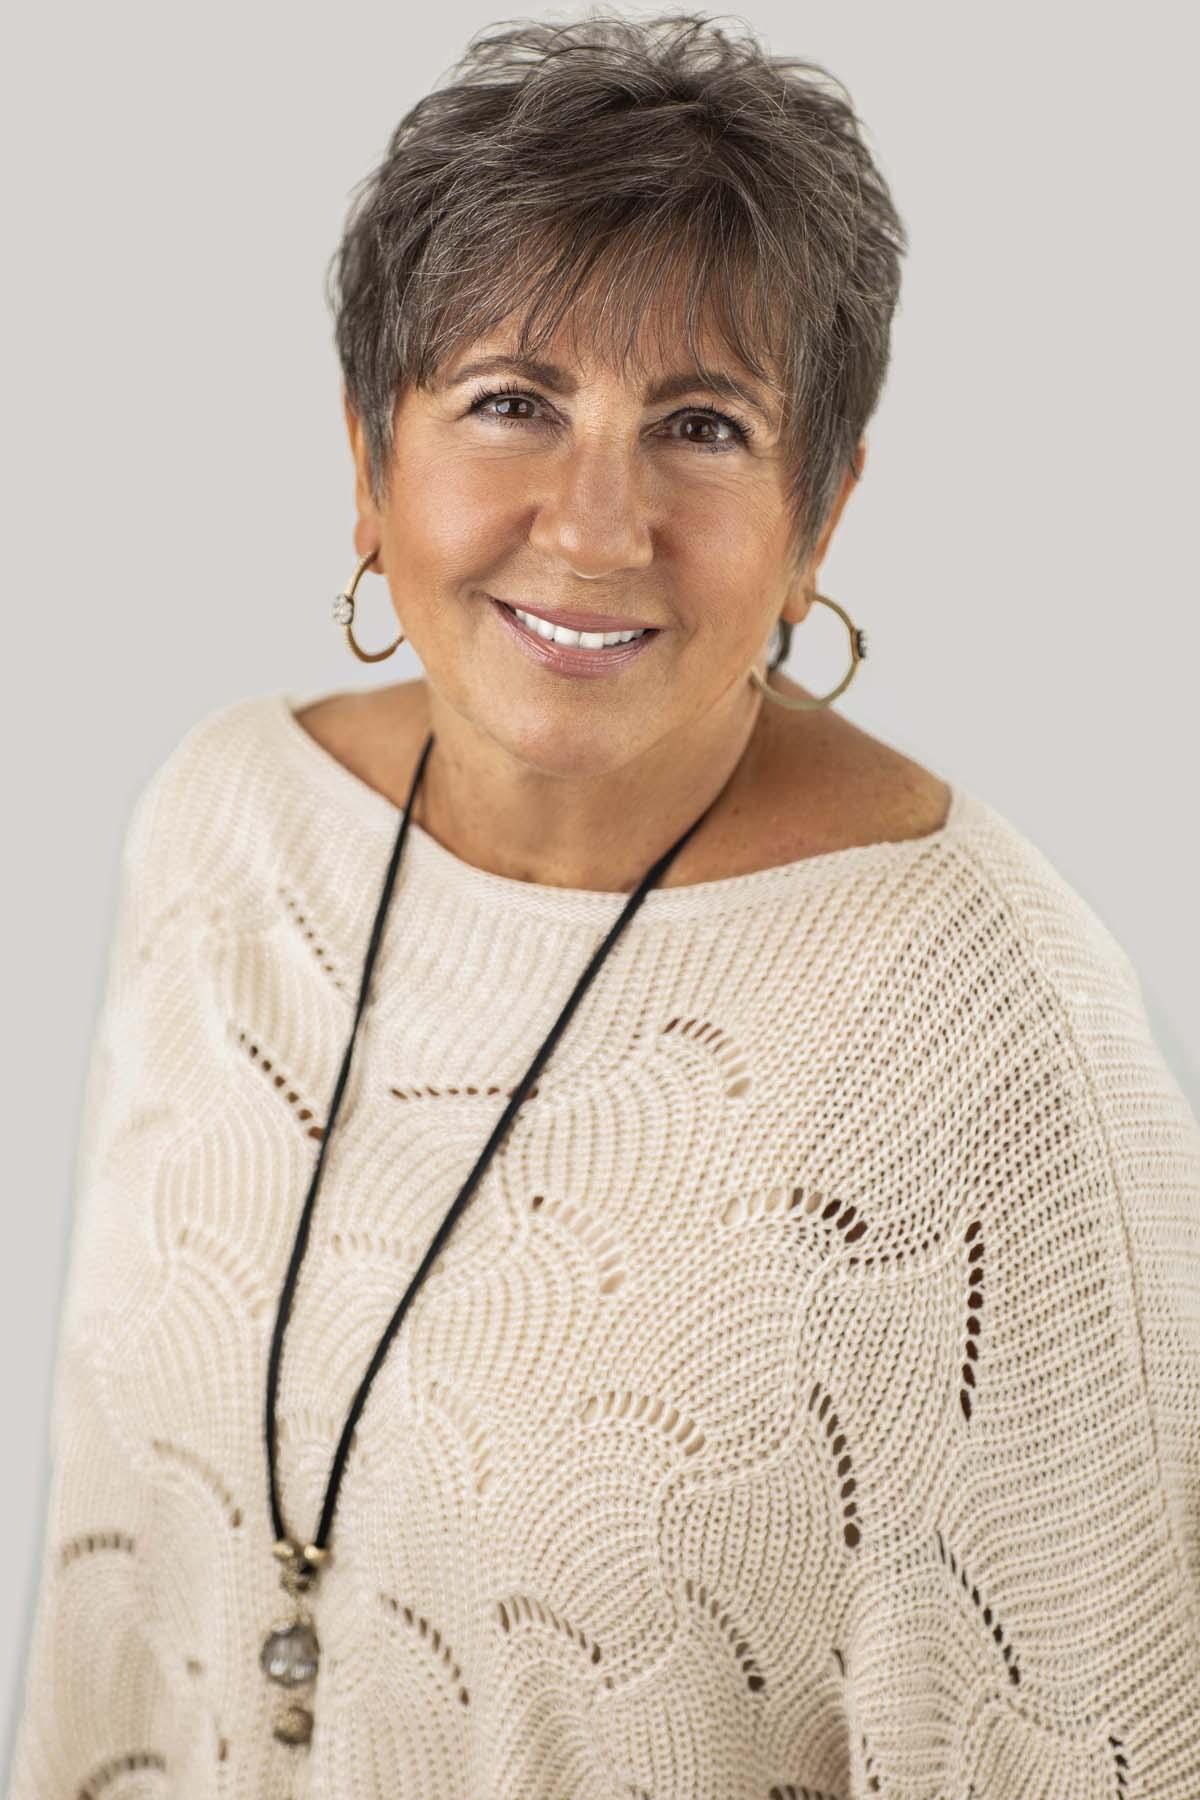 Diana D'Angelo